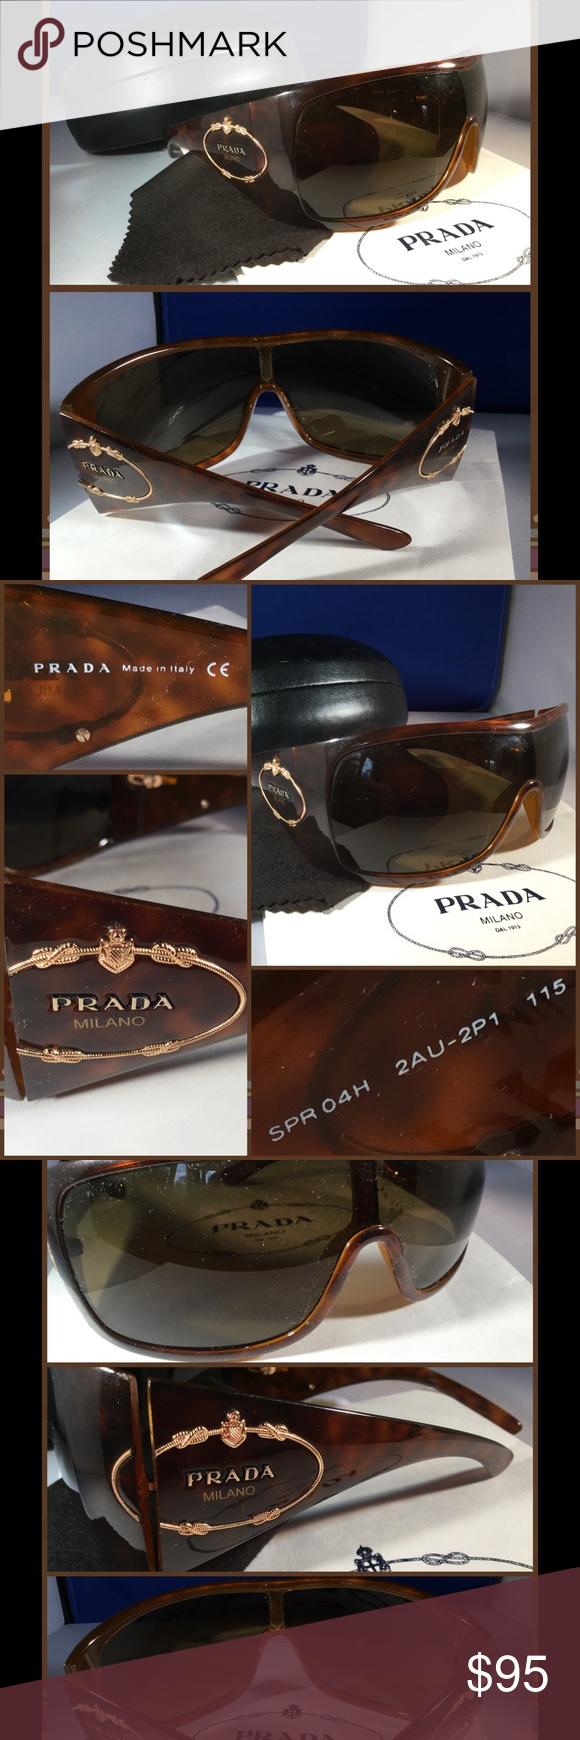 ddfb1bab37 PRADA Tortoise Havana Milano Shield Sunglasses  14 Gorgeous ...